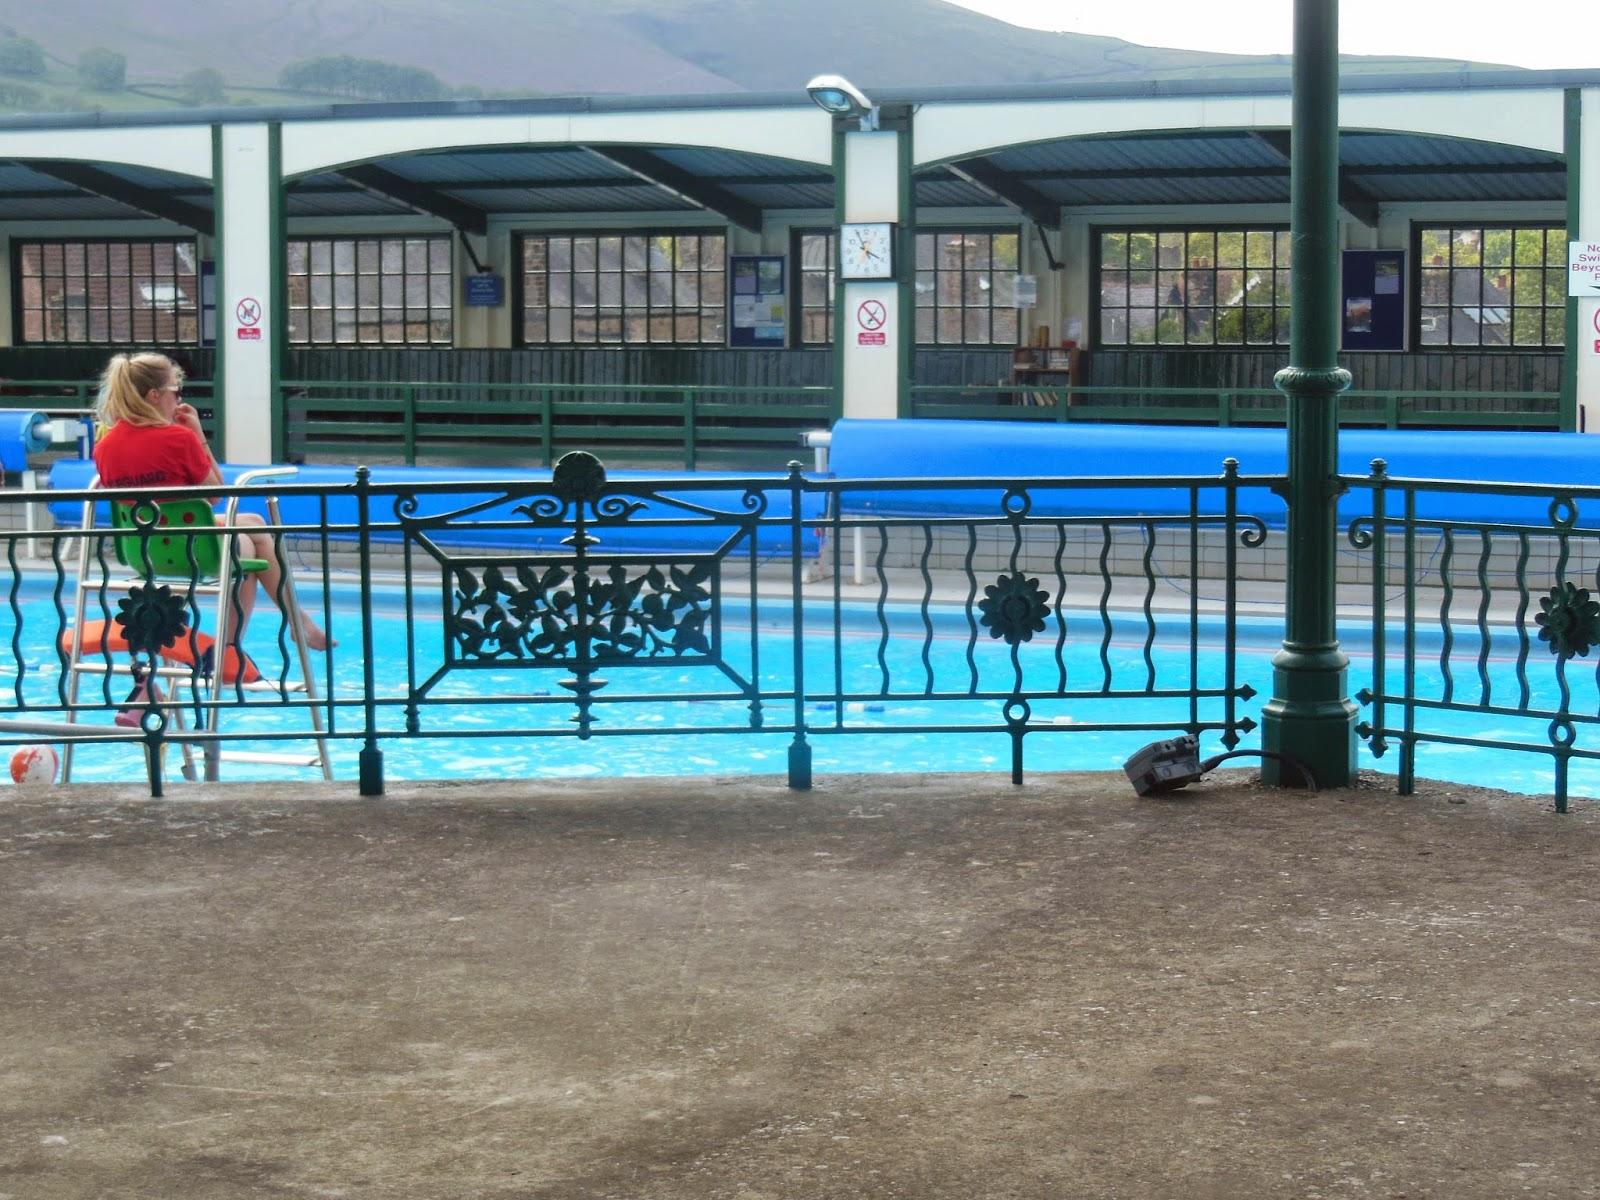 Heart shaped hathersage lido - Hathersage open air swimming pool ...